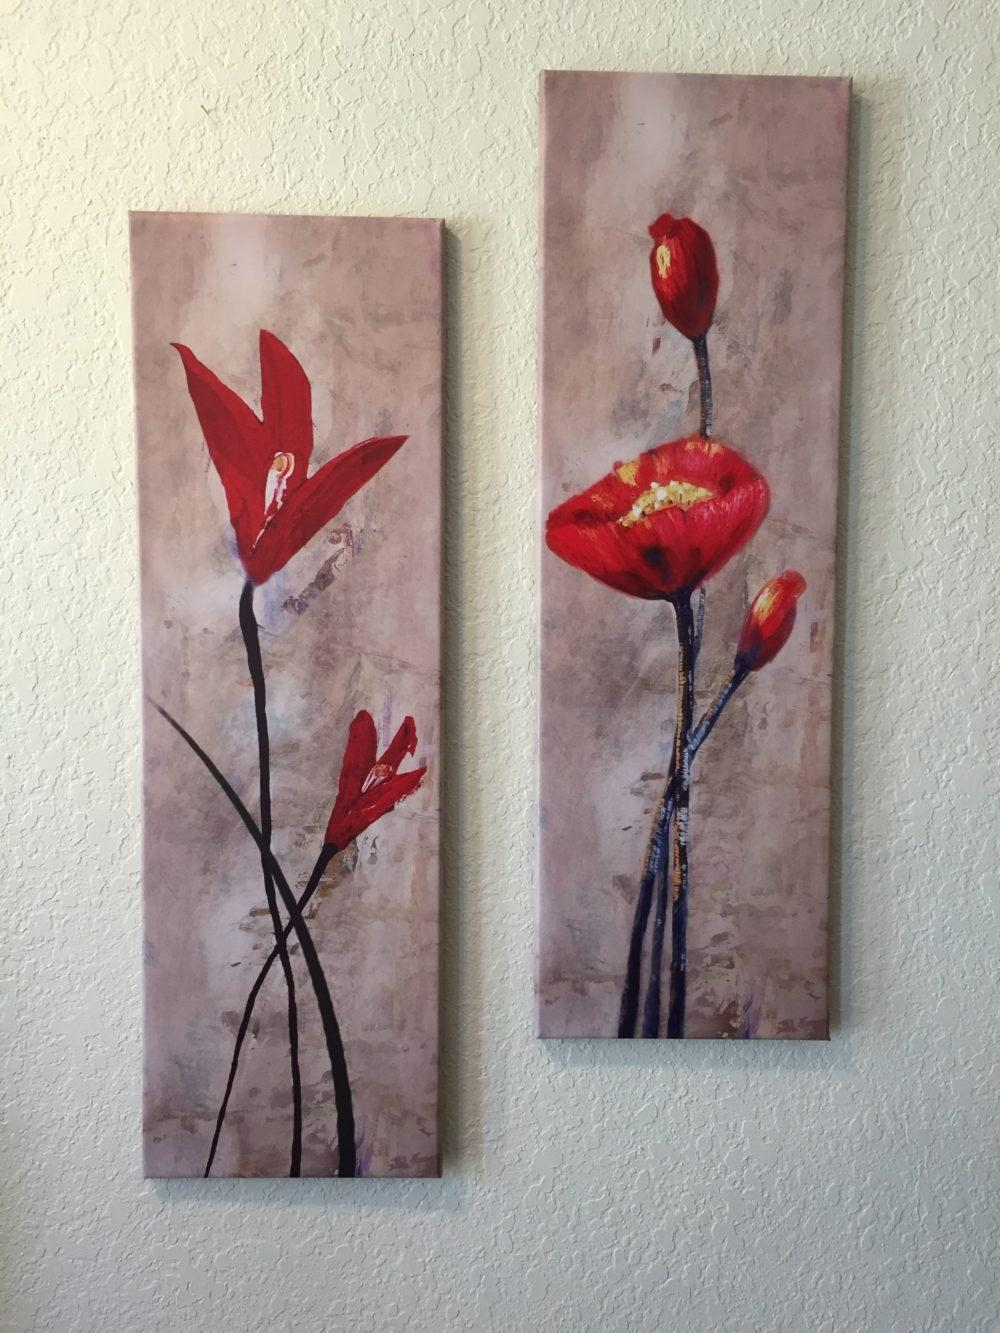 Flowers Composition Vertical Painting 2 Piece Wall Art Regarding 4 Piece Wall Art (Image 10 of 19)